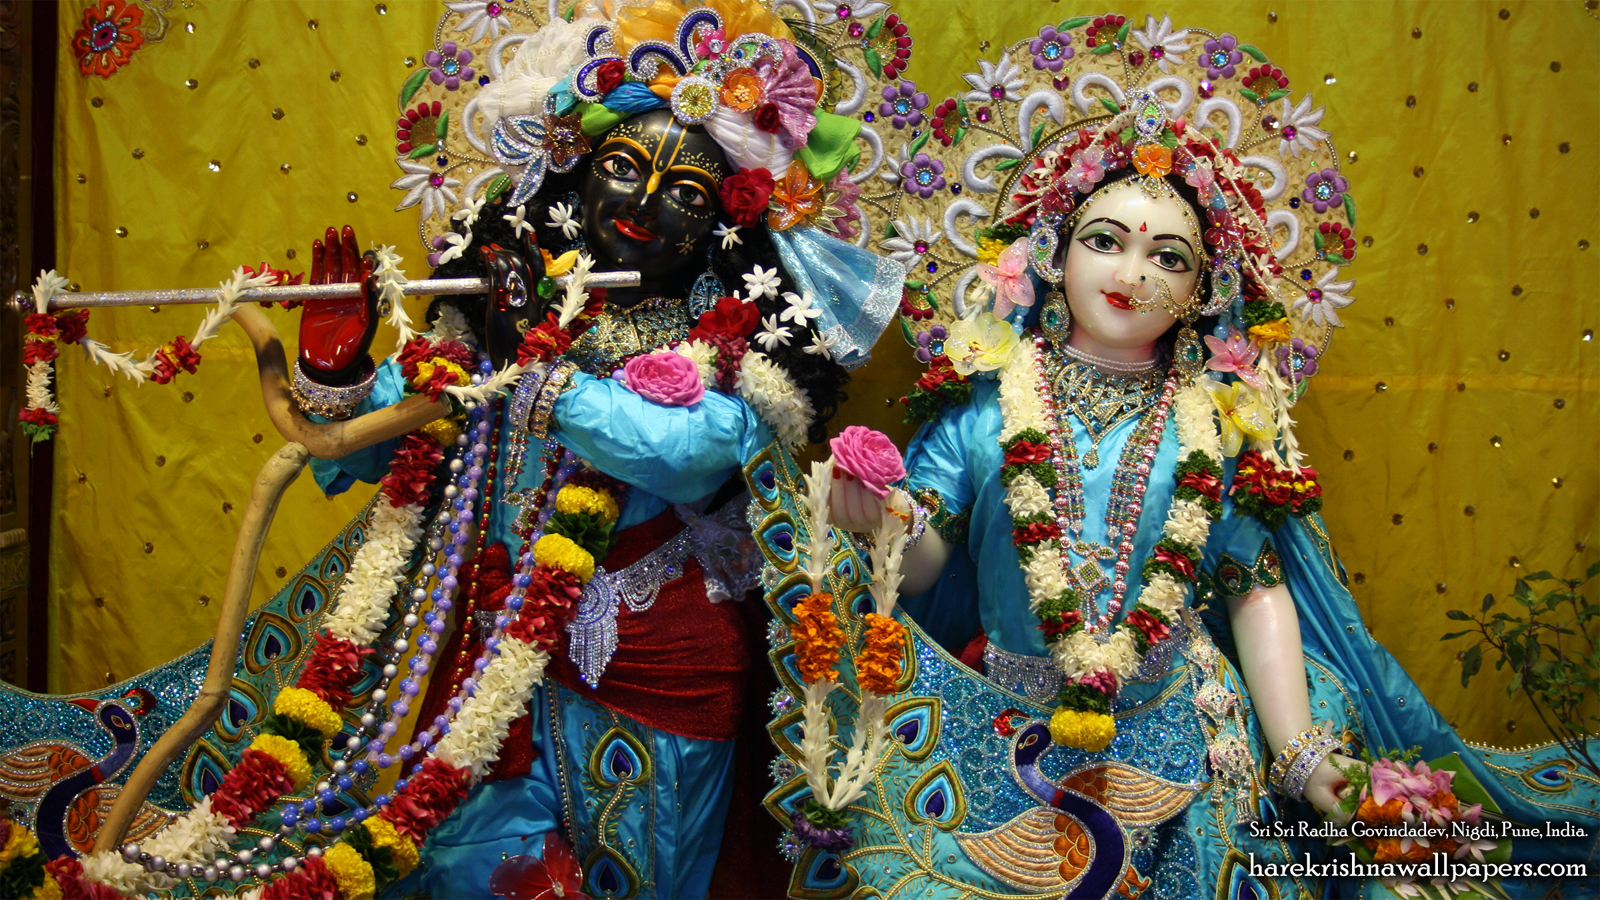 Sri Sri Radha Govind Close up Wallpaper (010) Size 1600x900 Download